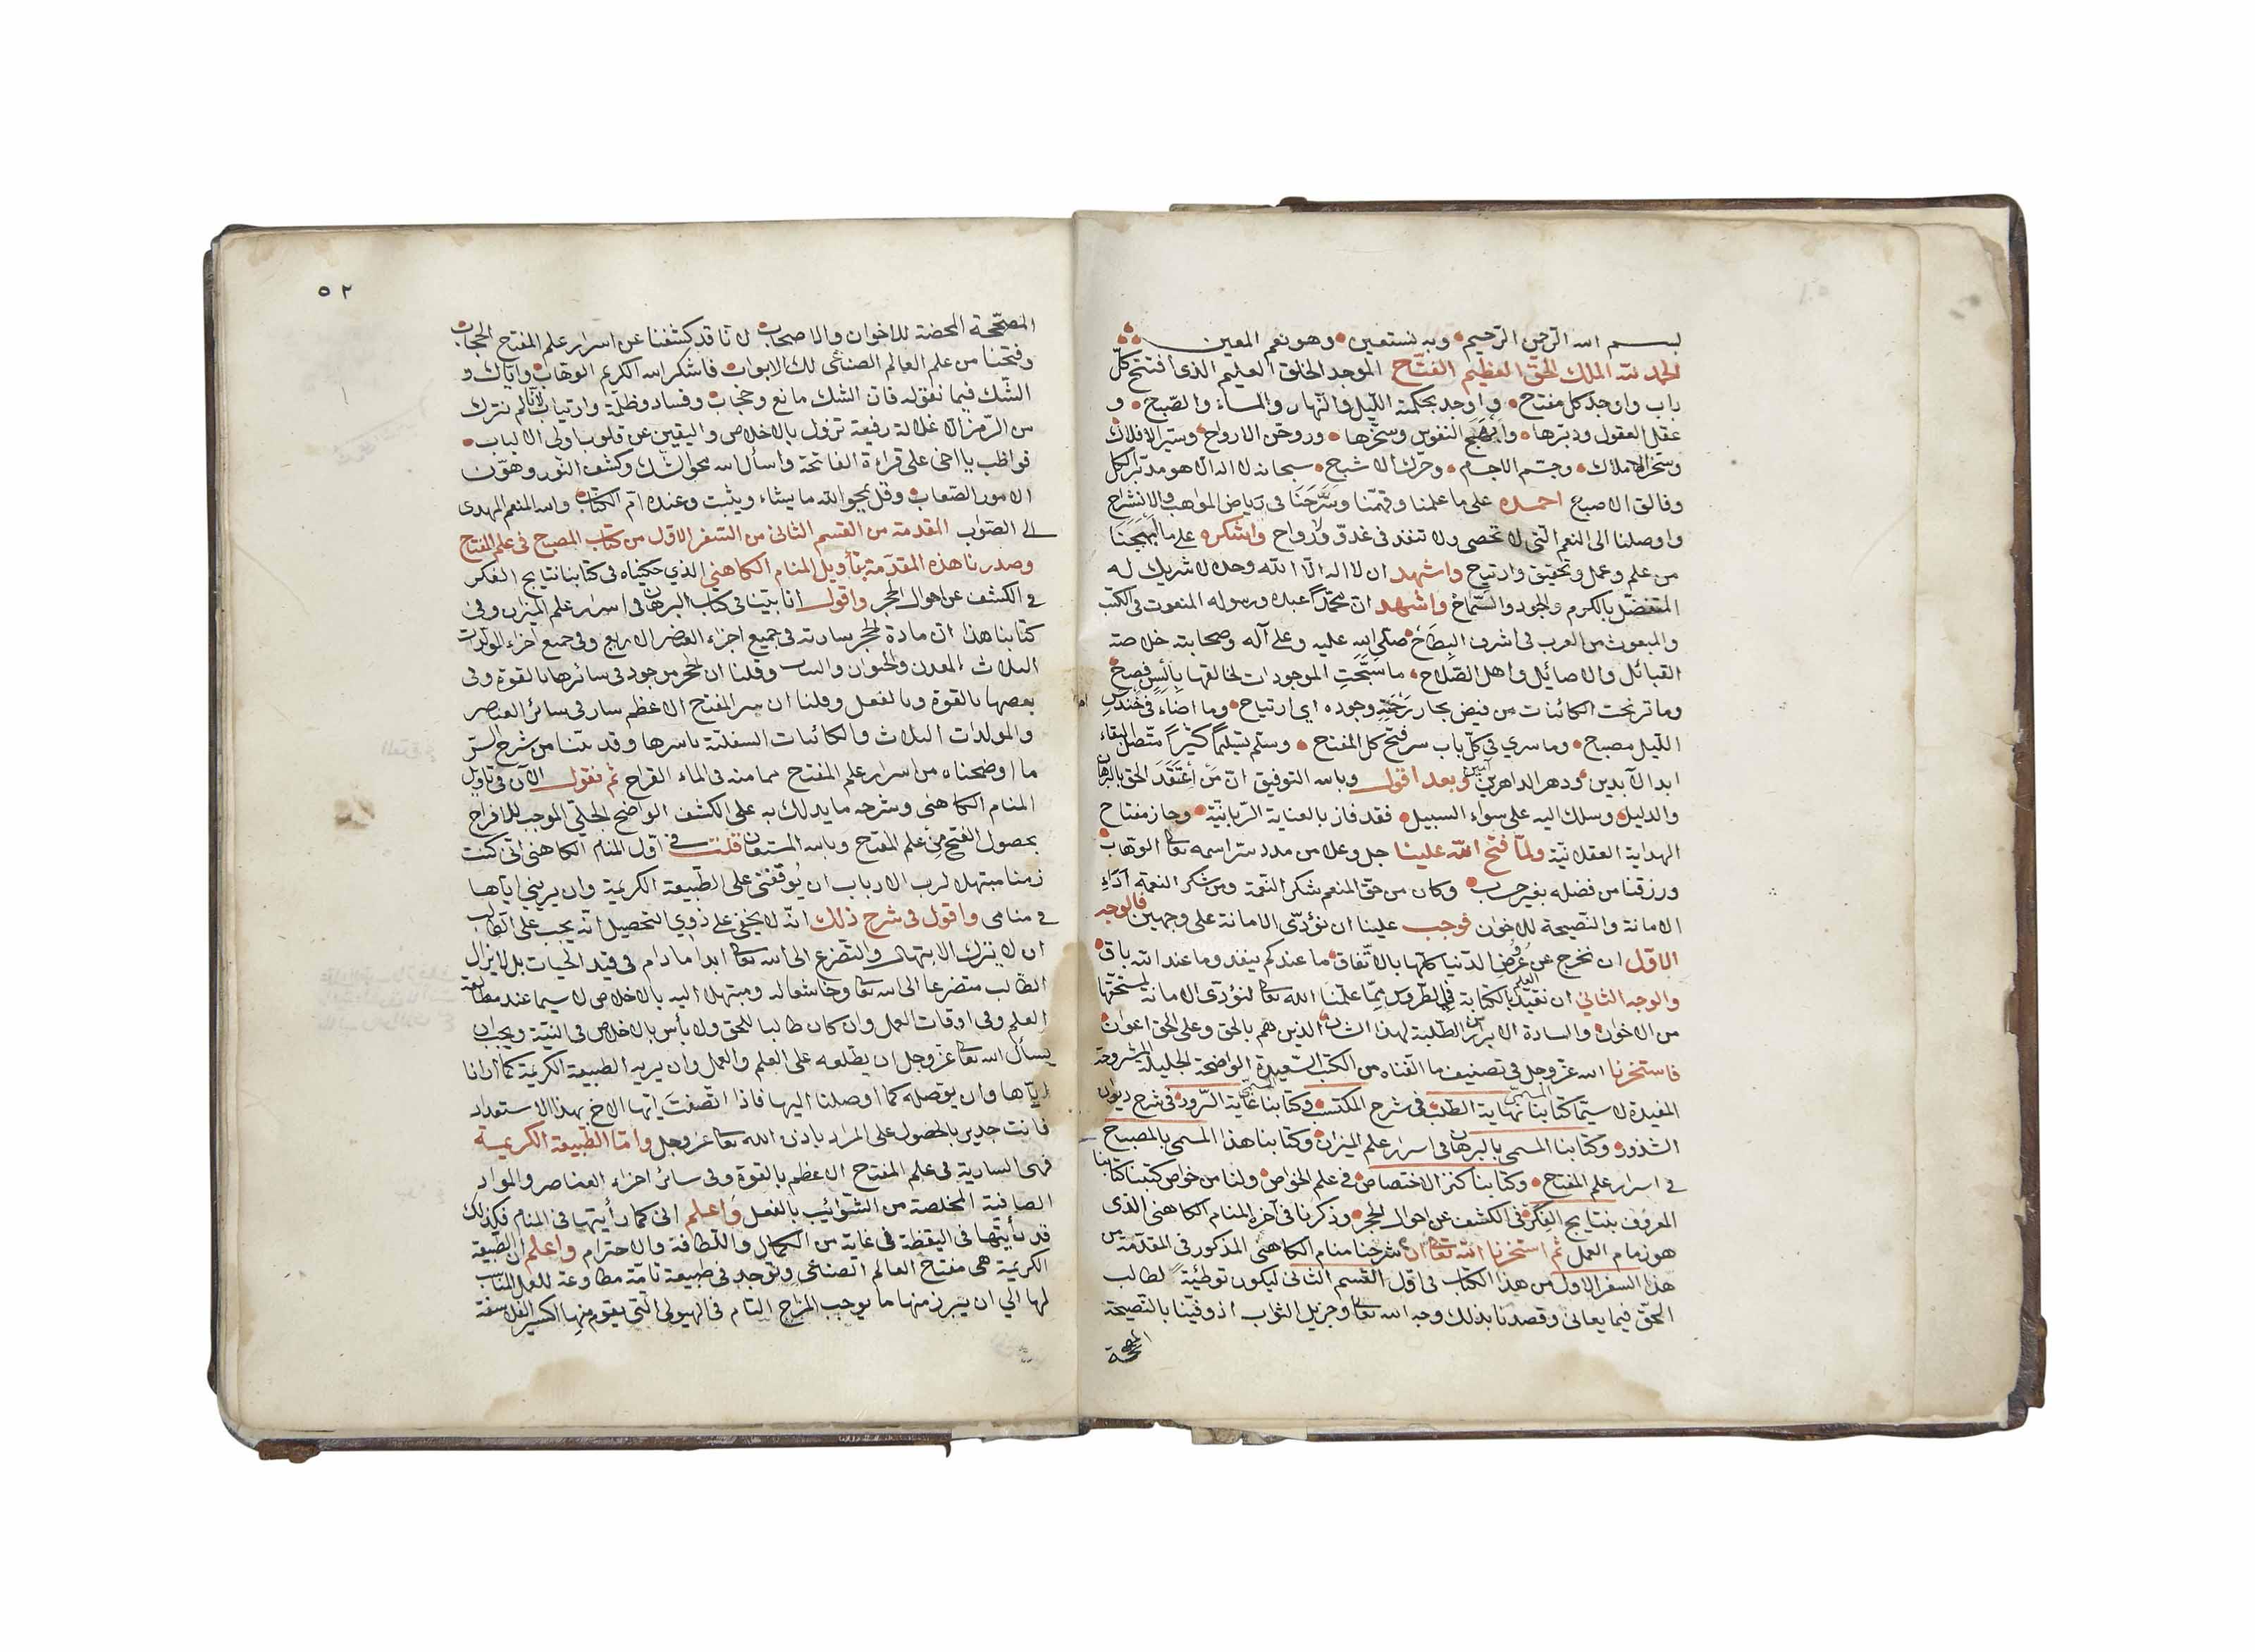 'ALI BIN MUHAMMAD BIN AYDAMAR AL-JALDAKI (D.1342 AD): AL-MISBAH FI 'ILM AL-MIFTAH